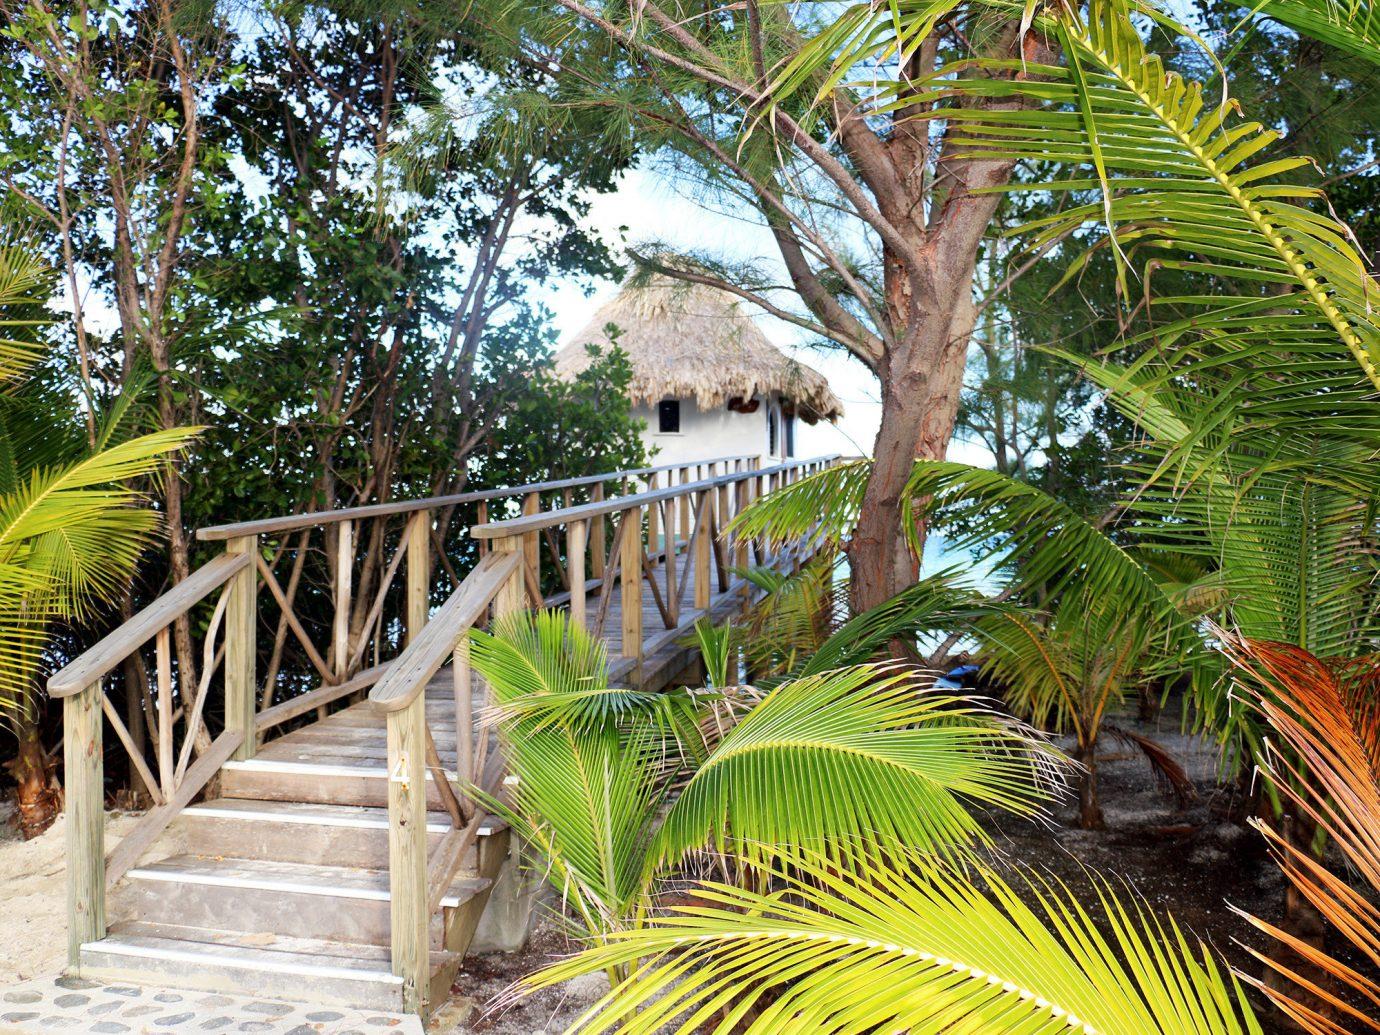 Eco Exterior Grounds Hotels Resort tree outdoor palm botany tropics rainforest Jungle arecales plant palm family vacation walkway estate Garden caribbean botanical garden area shade